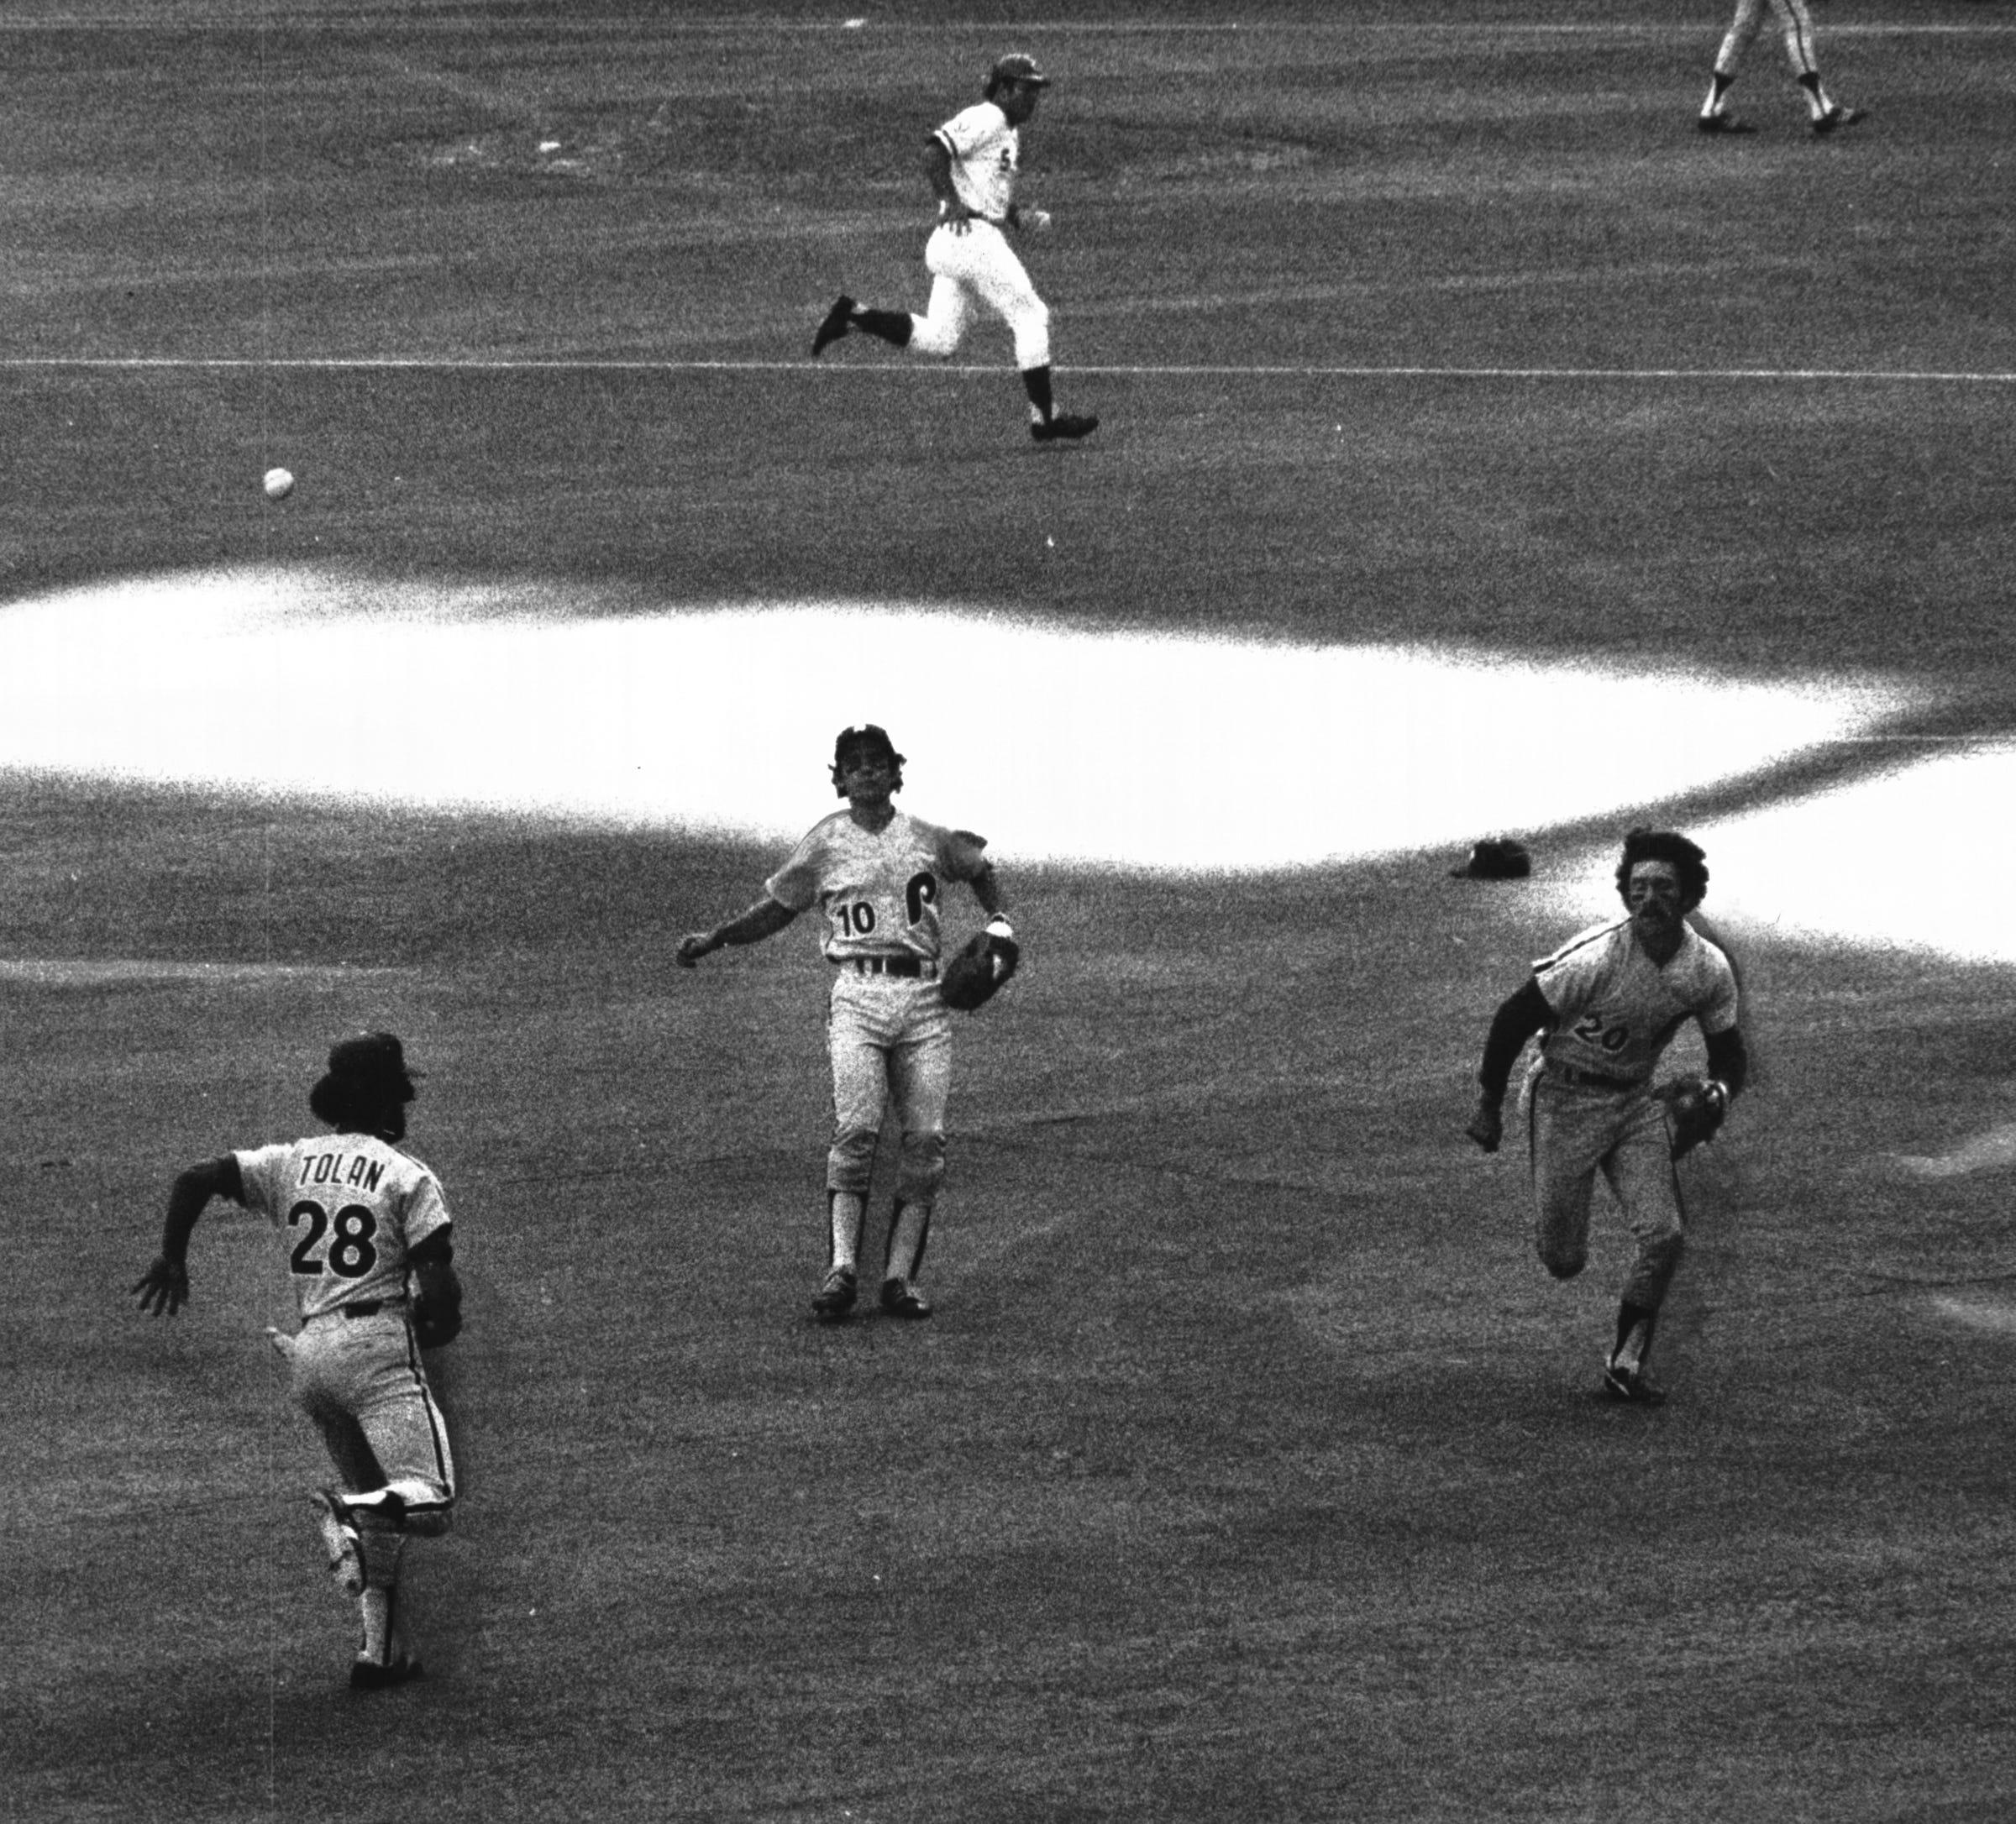 1976 Sporting News Baseball World Series Records Johnny Bench Cincinnati Reds